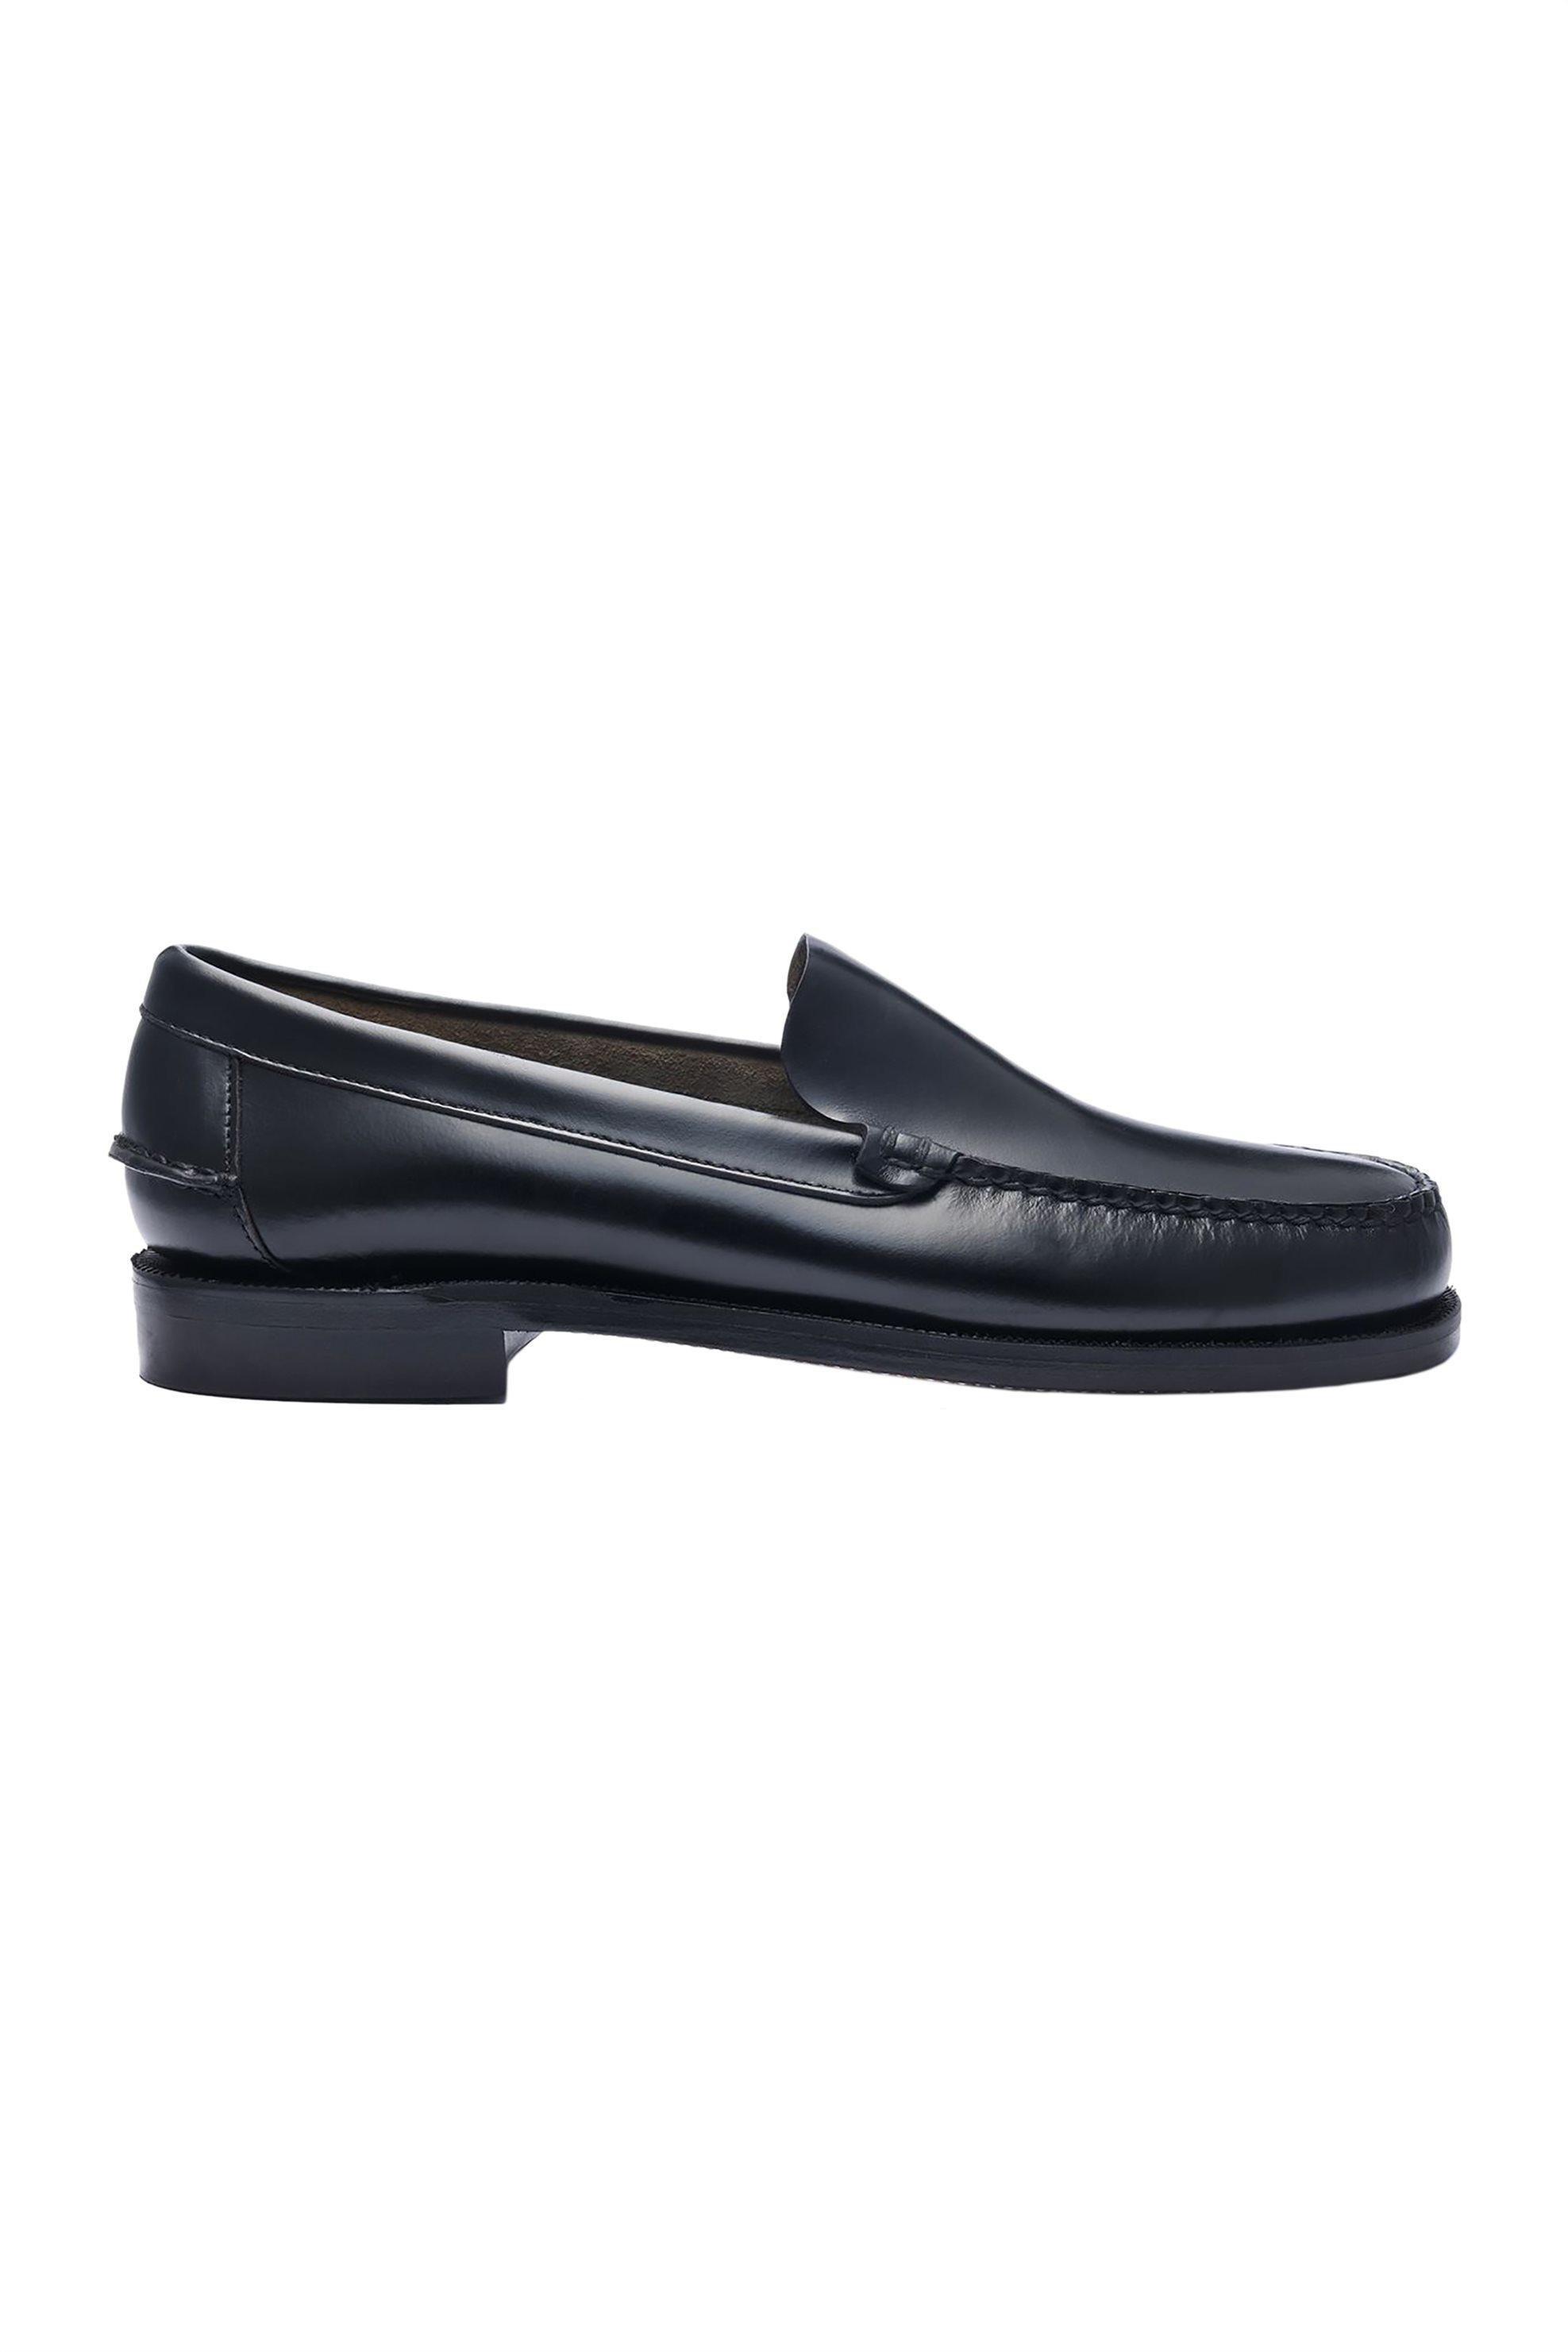 Notos Sebago ανδρικά loafers δερμάτινα Frank – L70015A0-902 – Μαύρο 0ad05b08976